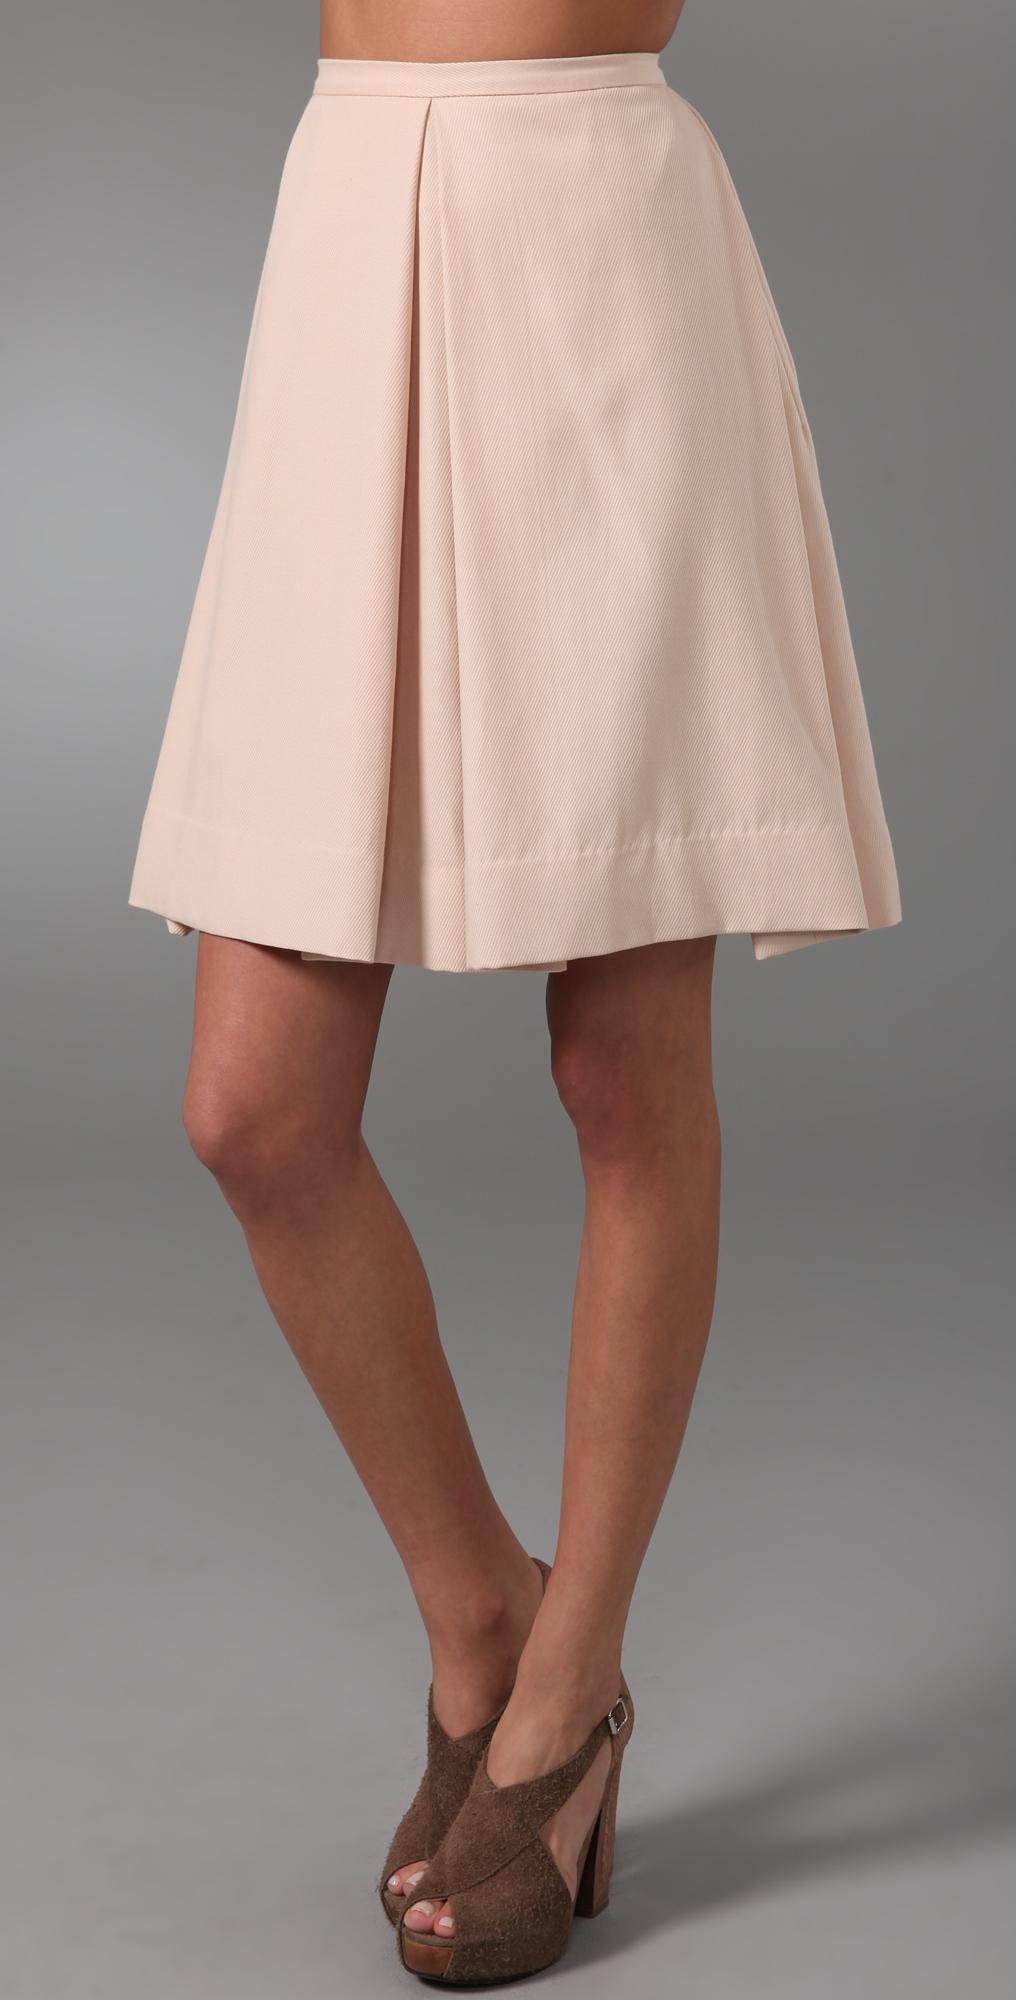 9eafc4ede 3.1 Phillip Lim Box Pleat Skirt on PopScreen